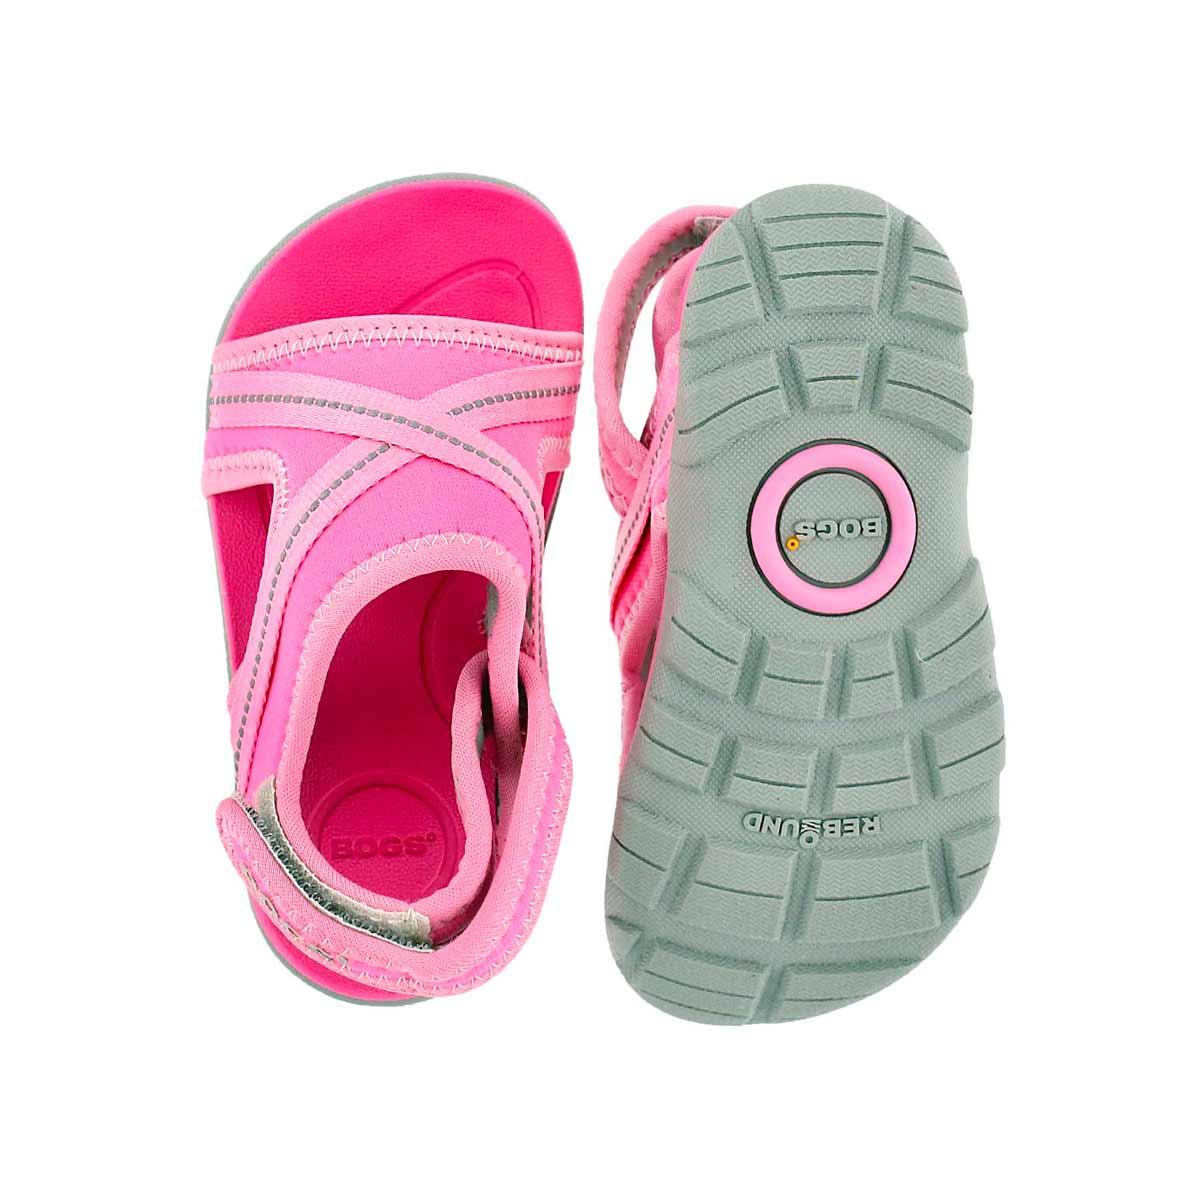 Inf Bluefish pnk multi wtpf sport sandal